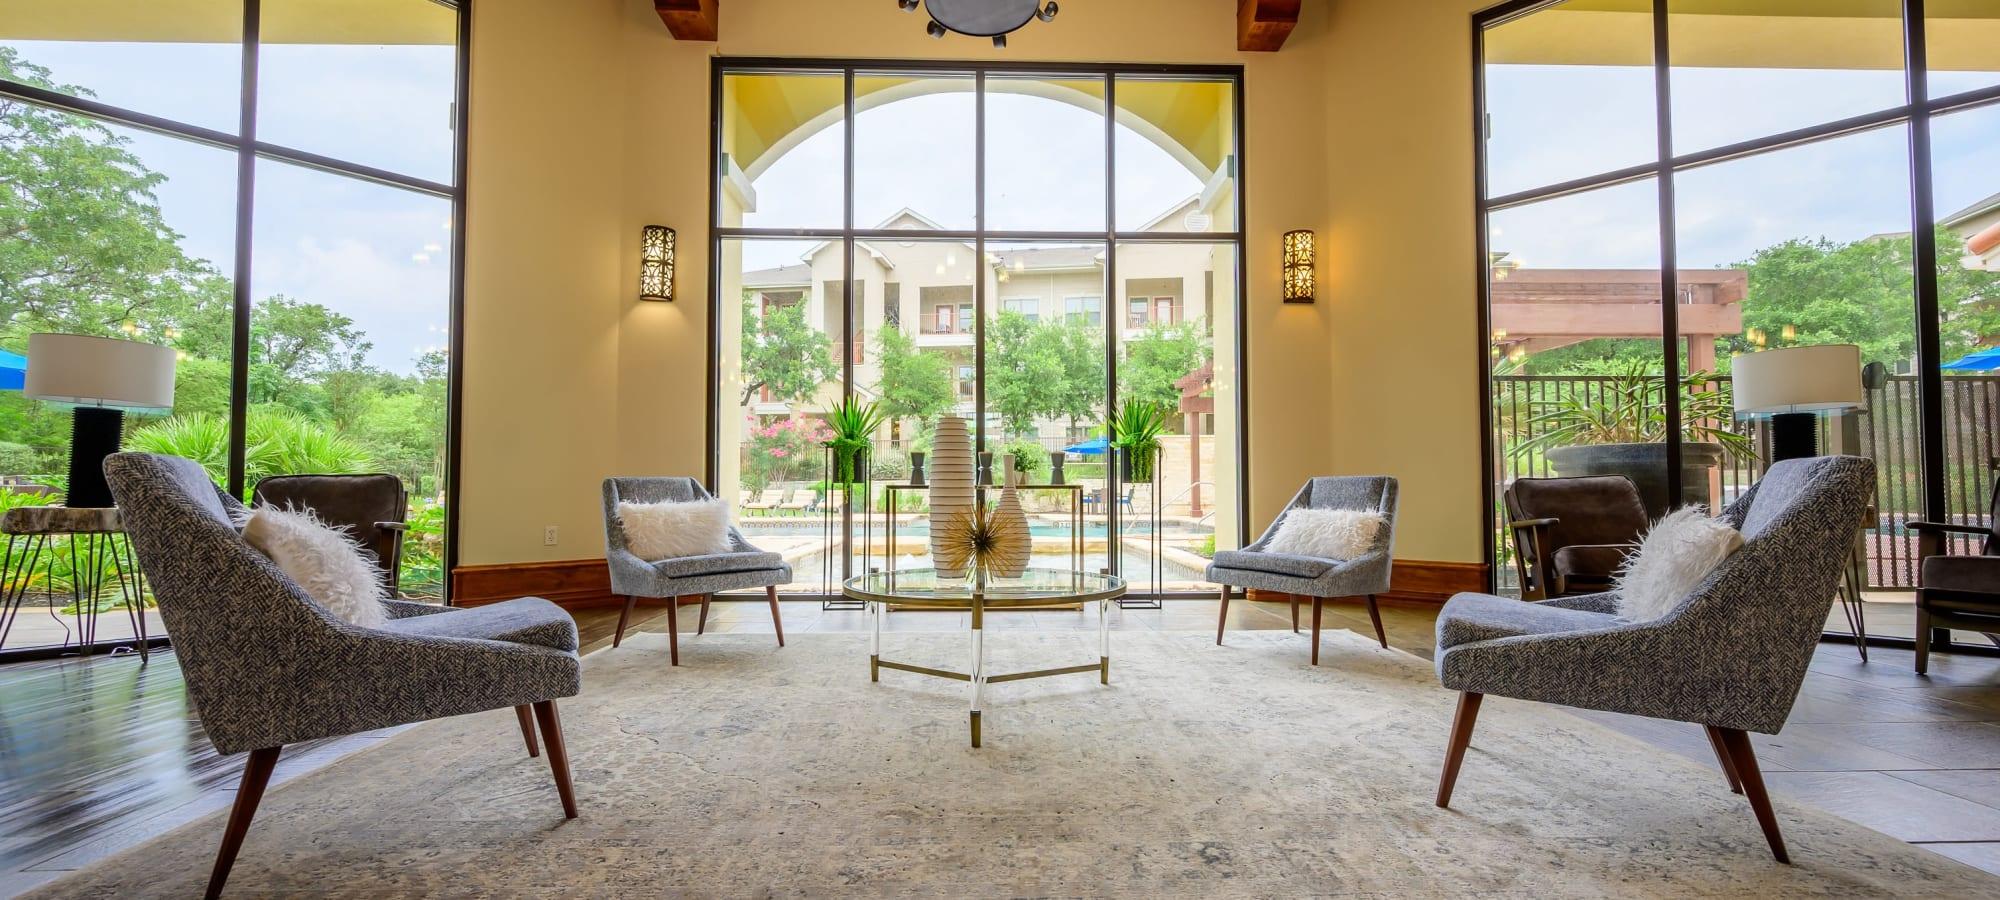 Apartments at Pecan Springs Apartments in San Antonio, Texas